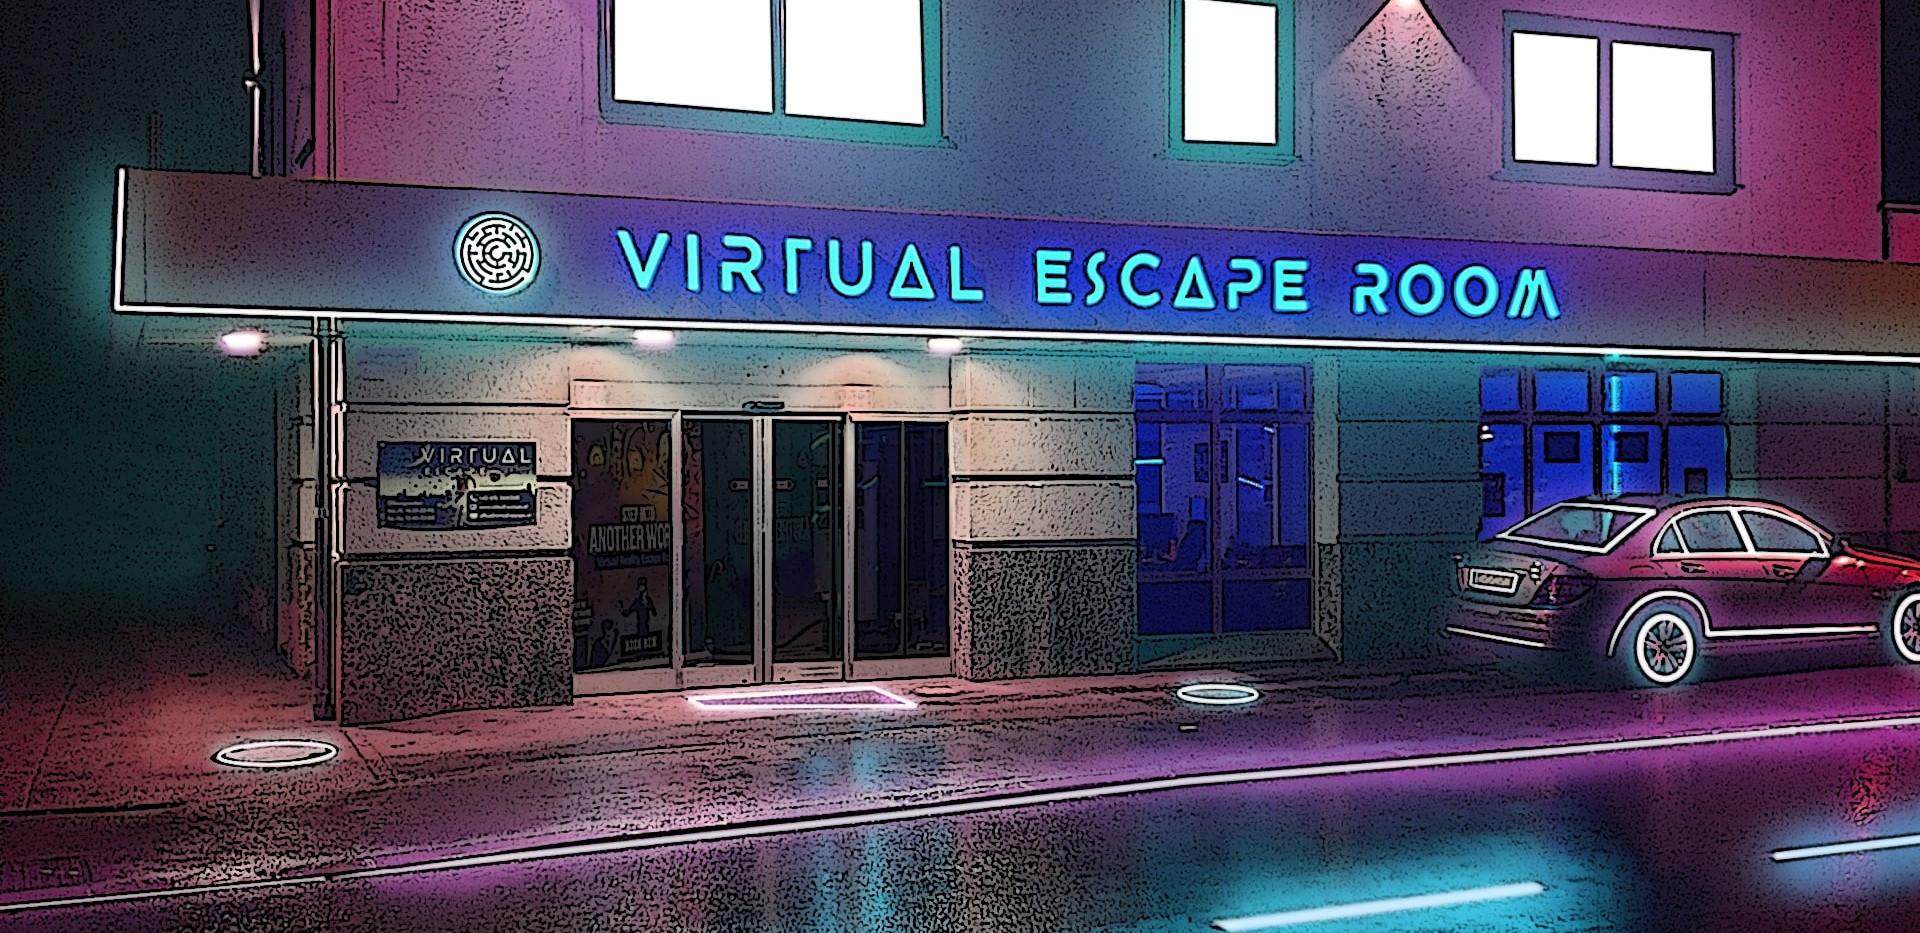 Eingang | Cyberpunk Online Escape Game |